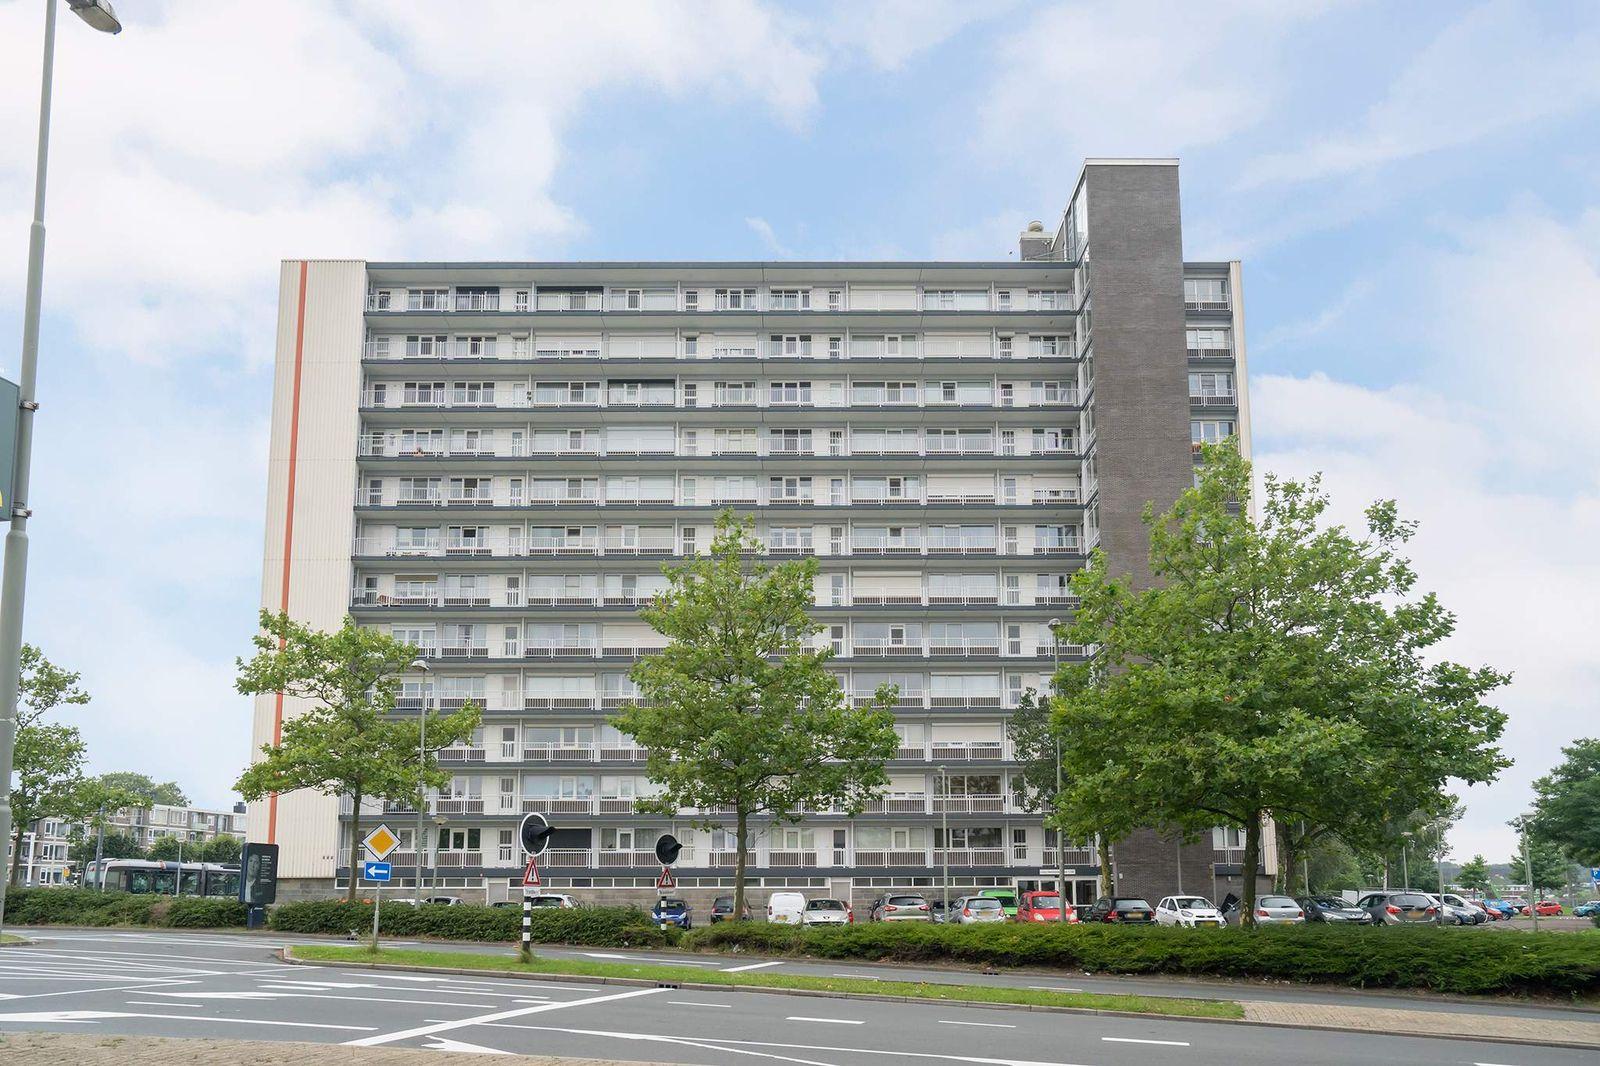 Louis Raemaekersstraat 123, Schiedam